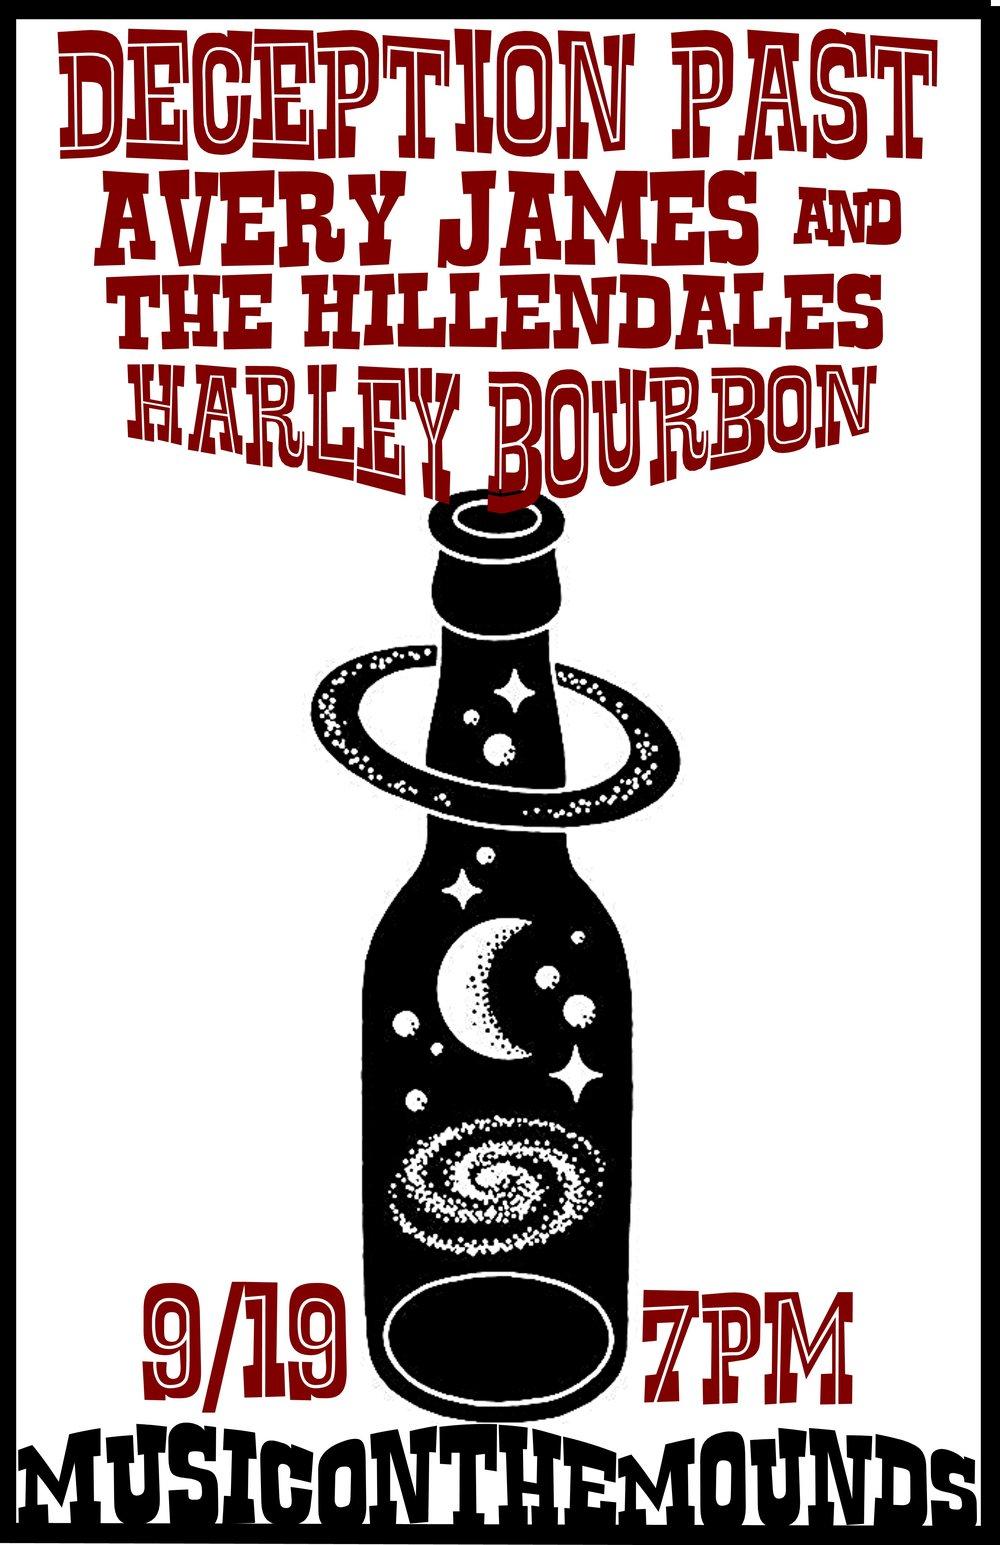 harley_bourbon_C0915.jpg